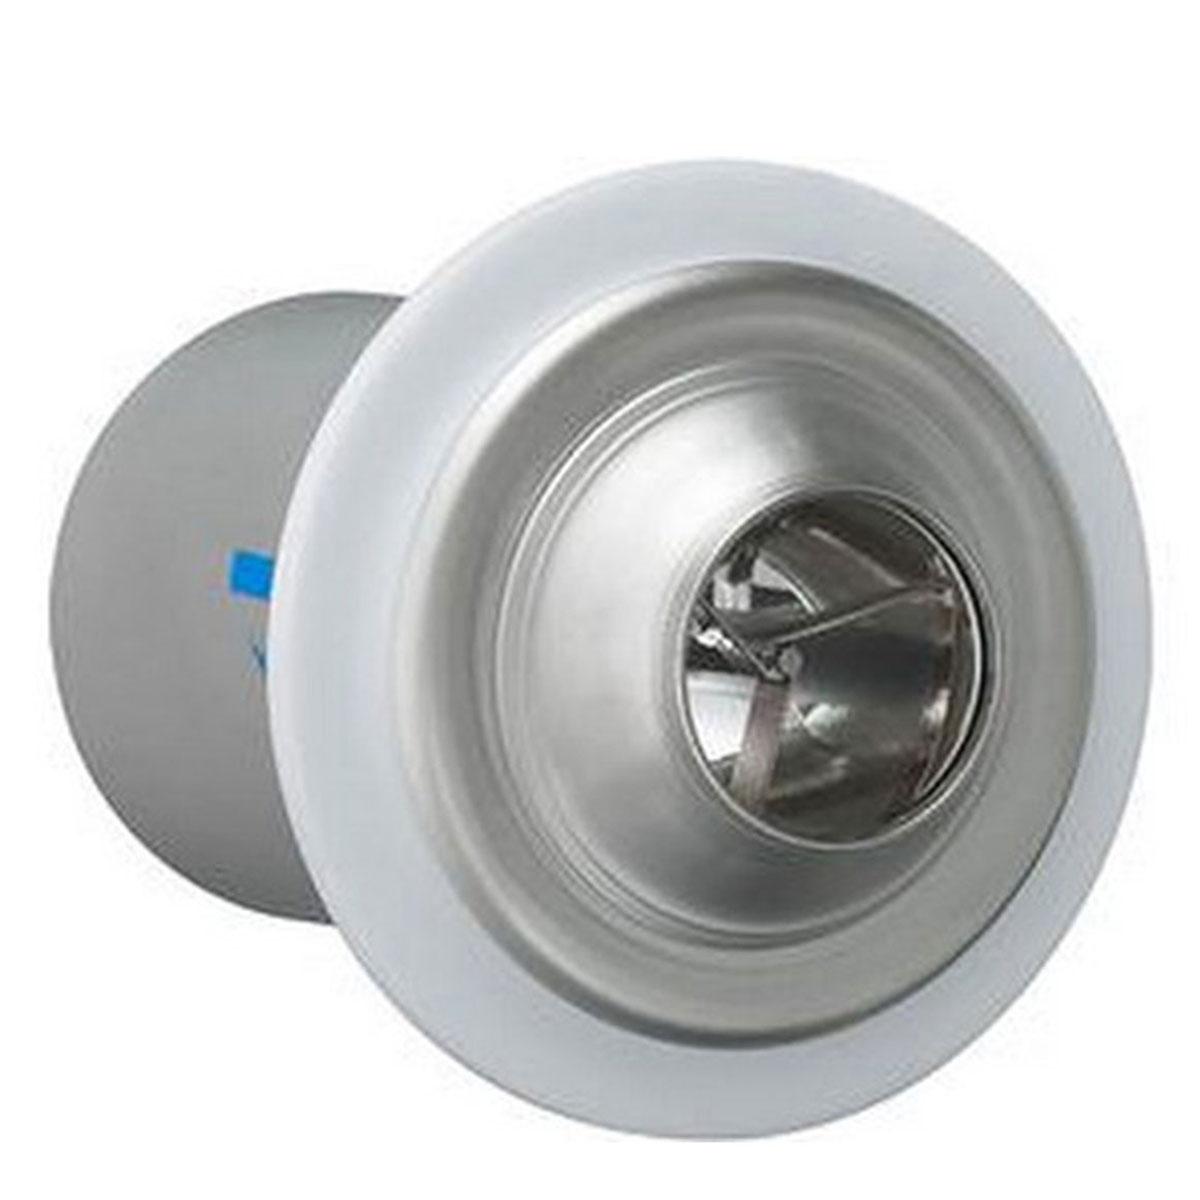 Sony Bravia Vpl Vw200 Sxrd Projector Lamp New Xenon Bulb